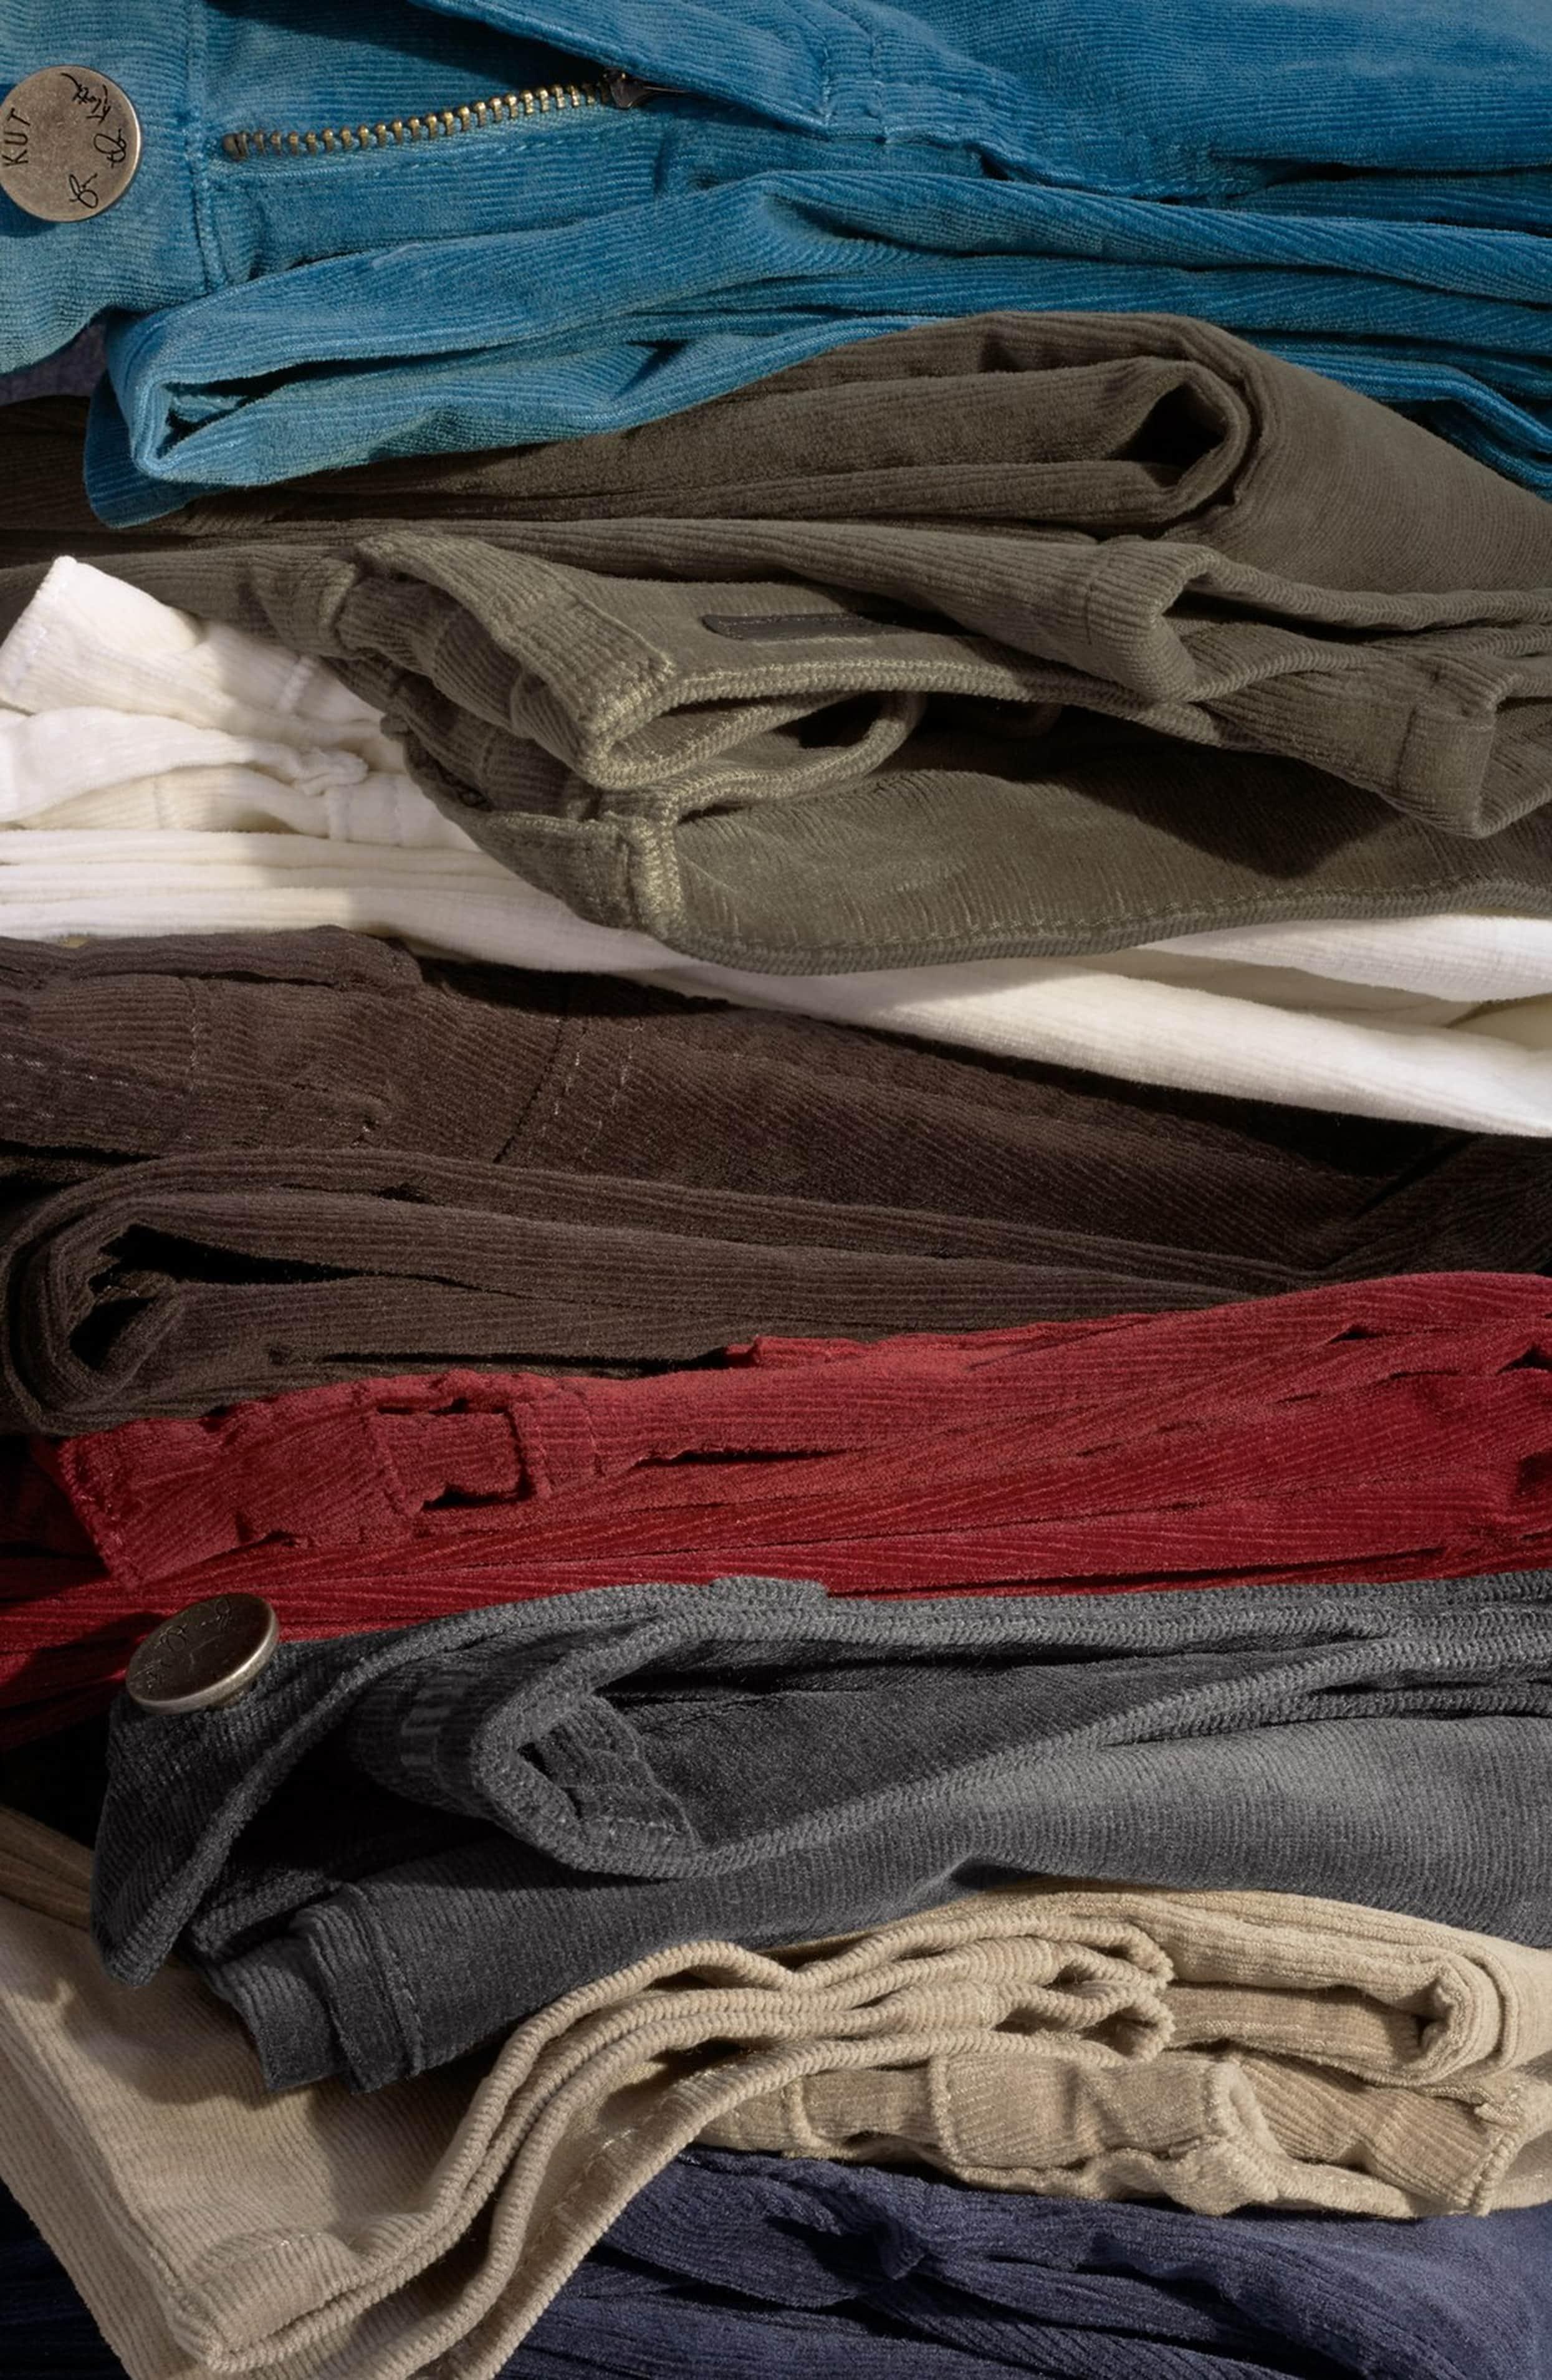 many corduroy pants colors